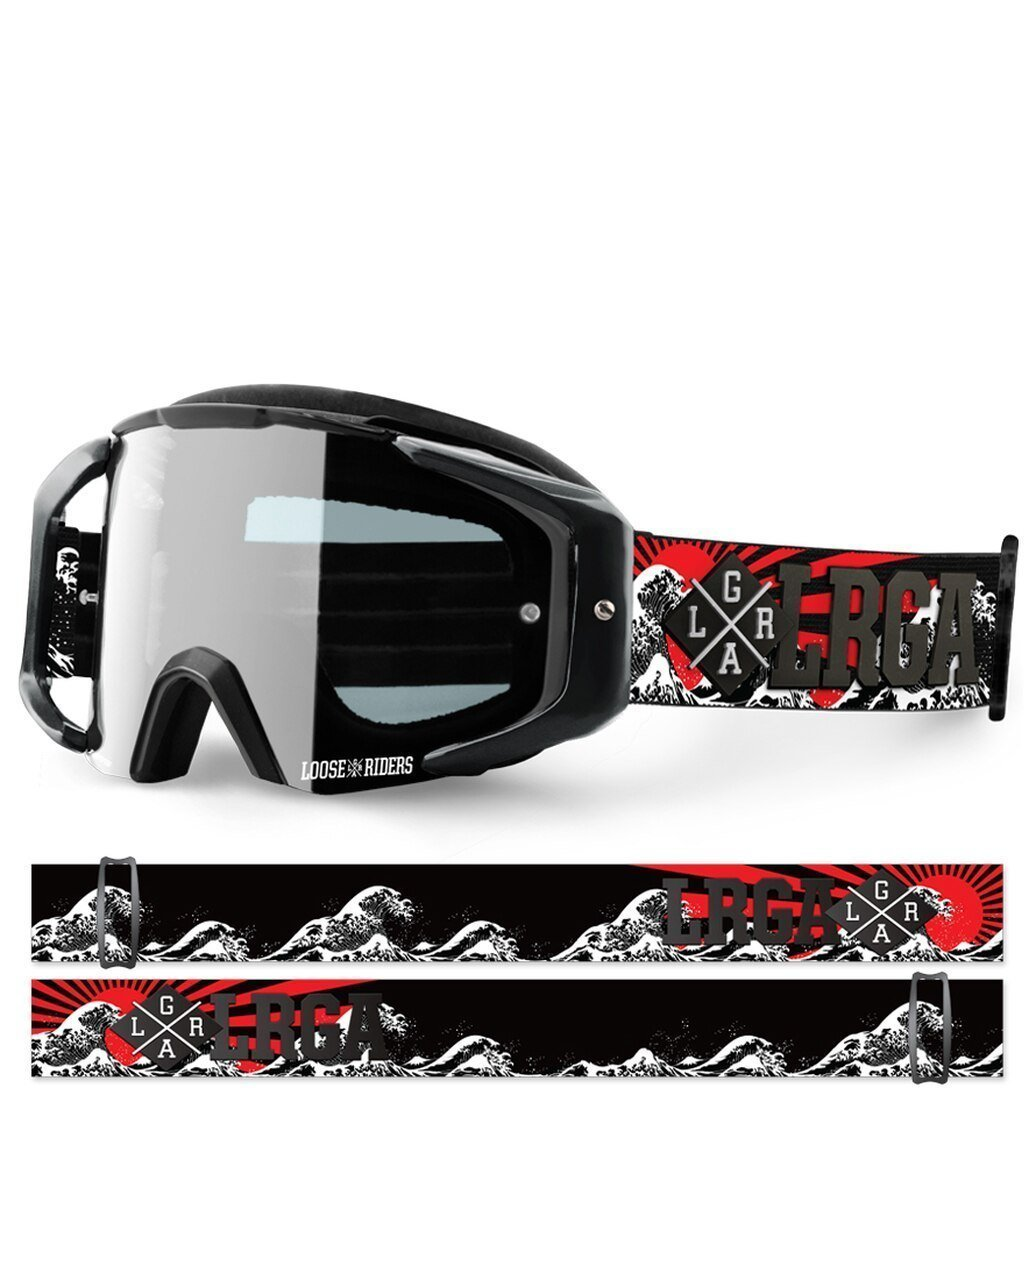 Loose Riders Goggles Australia